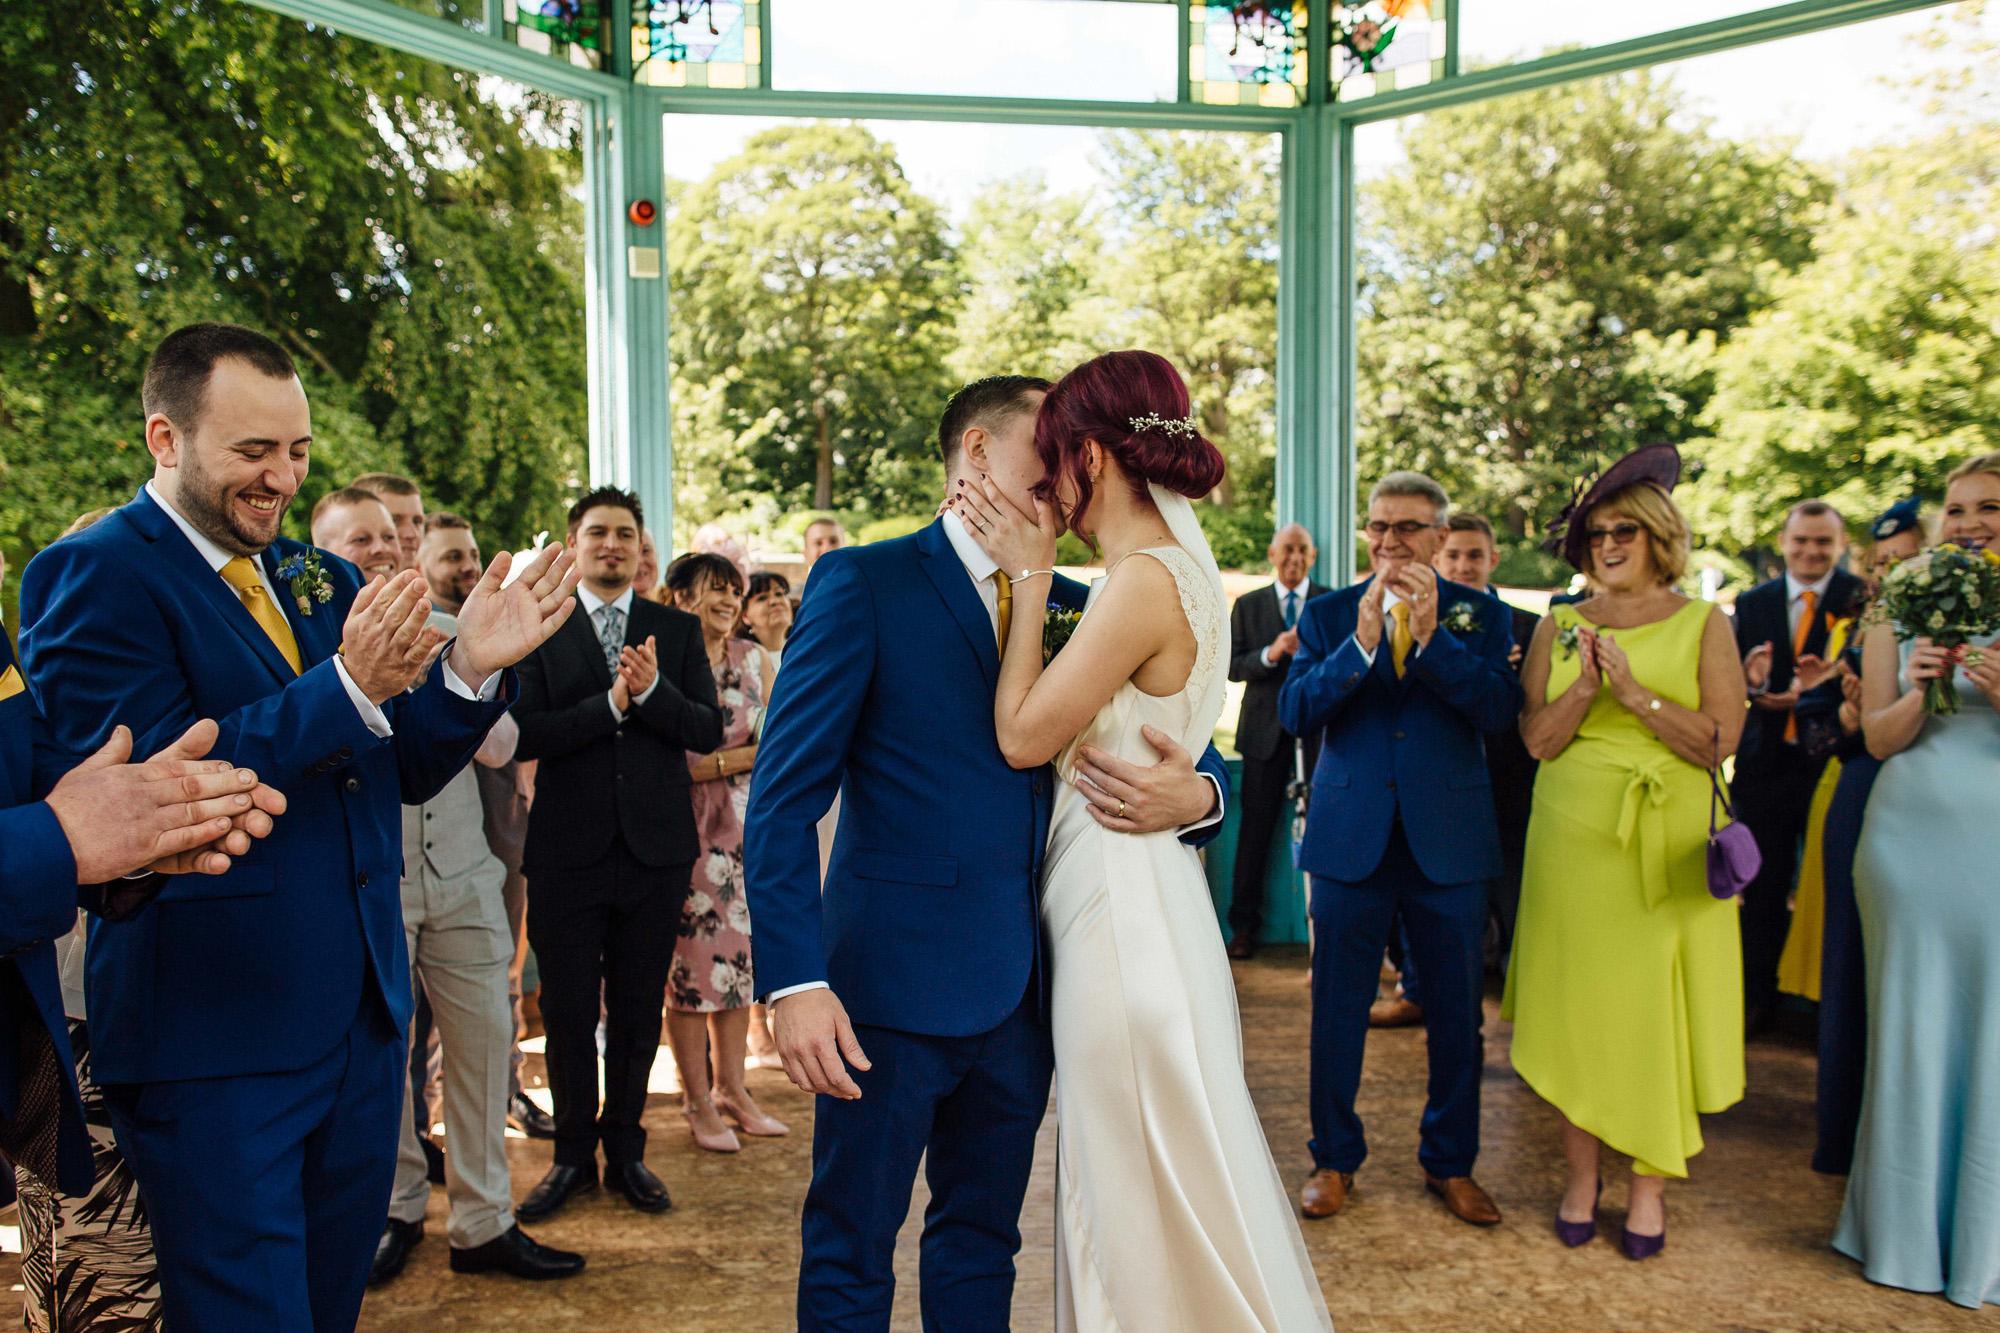 Sarah-Honeysuckle-Bias-Cut-Silk-Vintage-Inspired-Wedding-Gown-Sheffield-Wedding-Kate-Beaumont-20.jpg